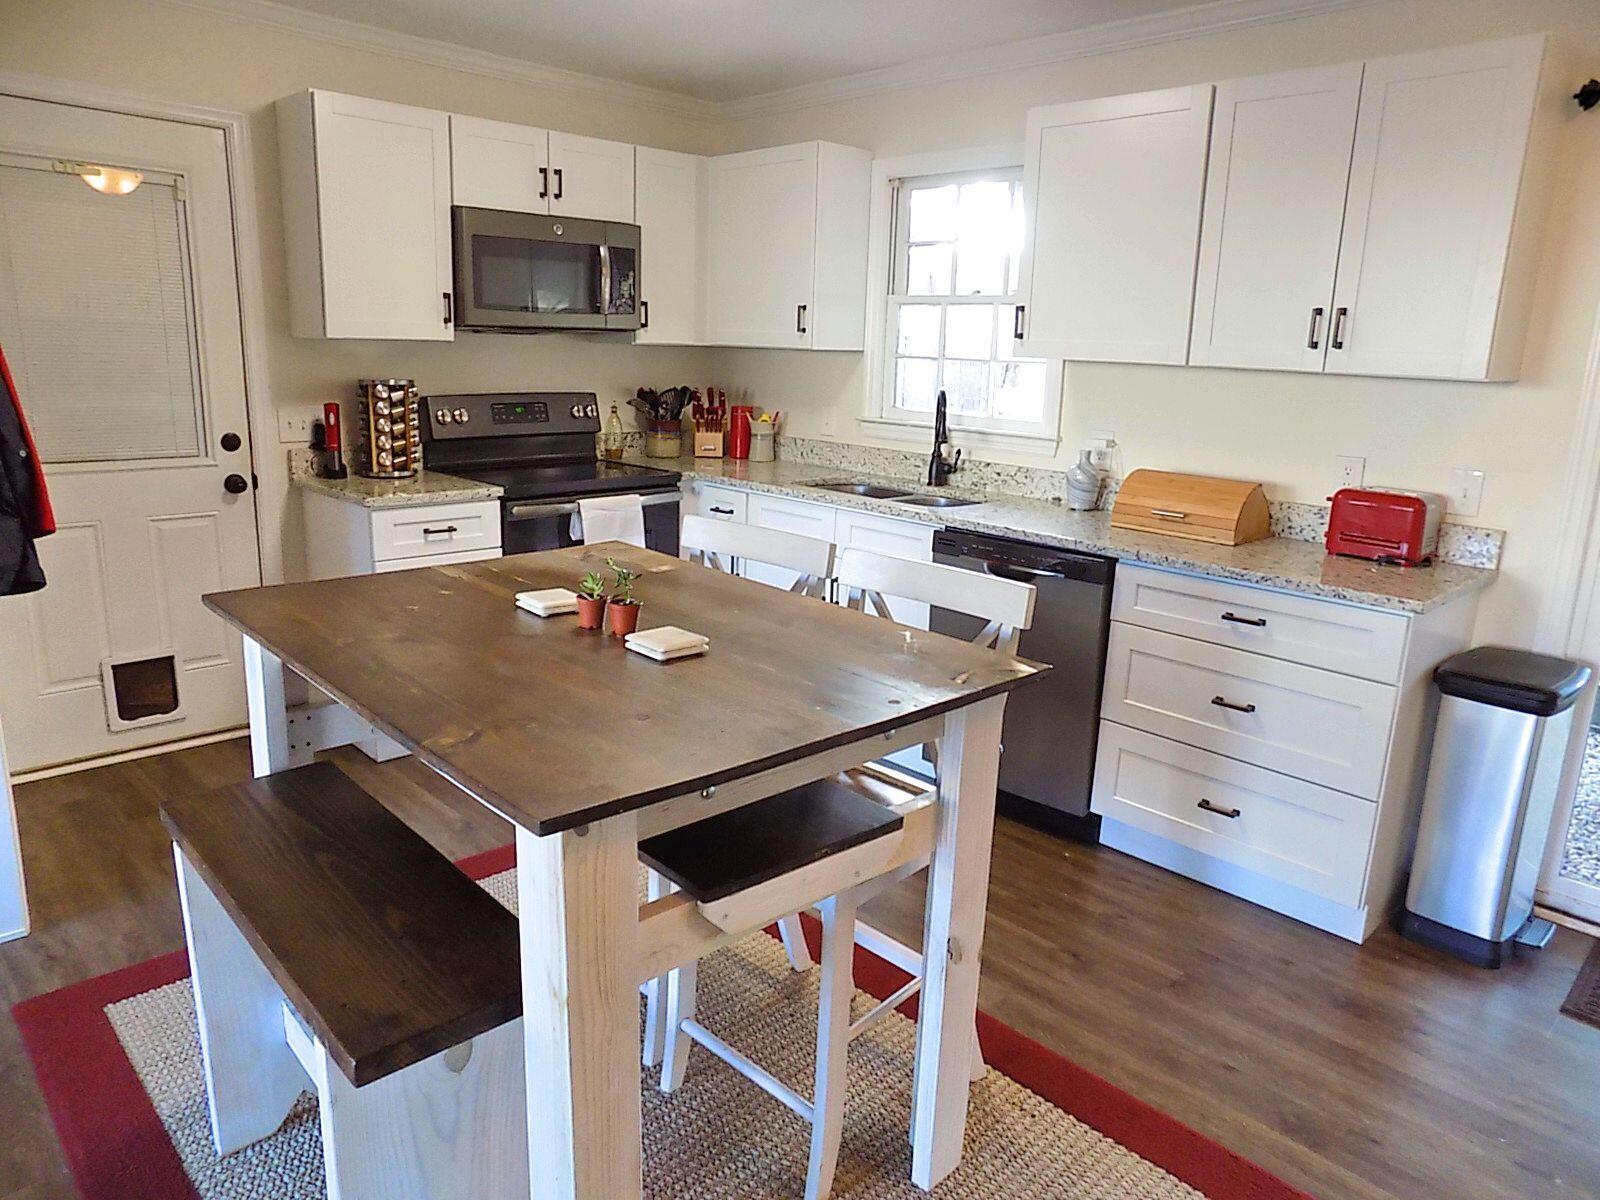 West Ashley Plantation Homes For Sale - 1720 Boone Hall, Charleston, SC - 16